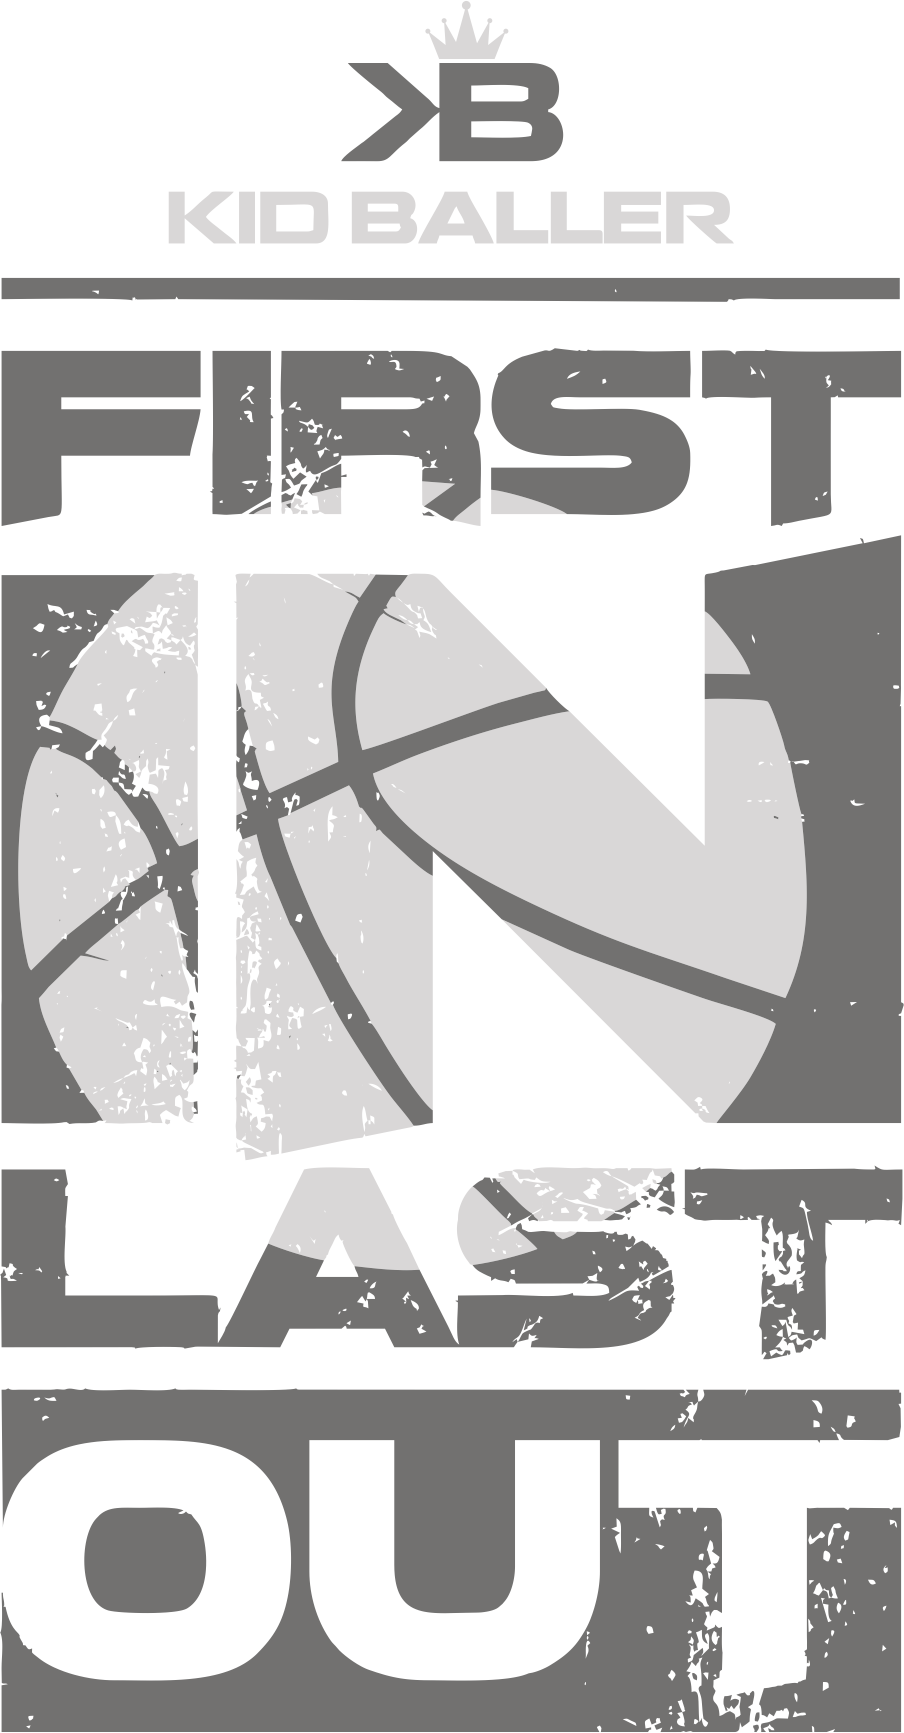 Kid Baller Basketball lifestyle brand